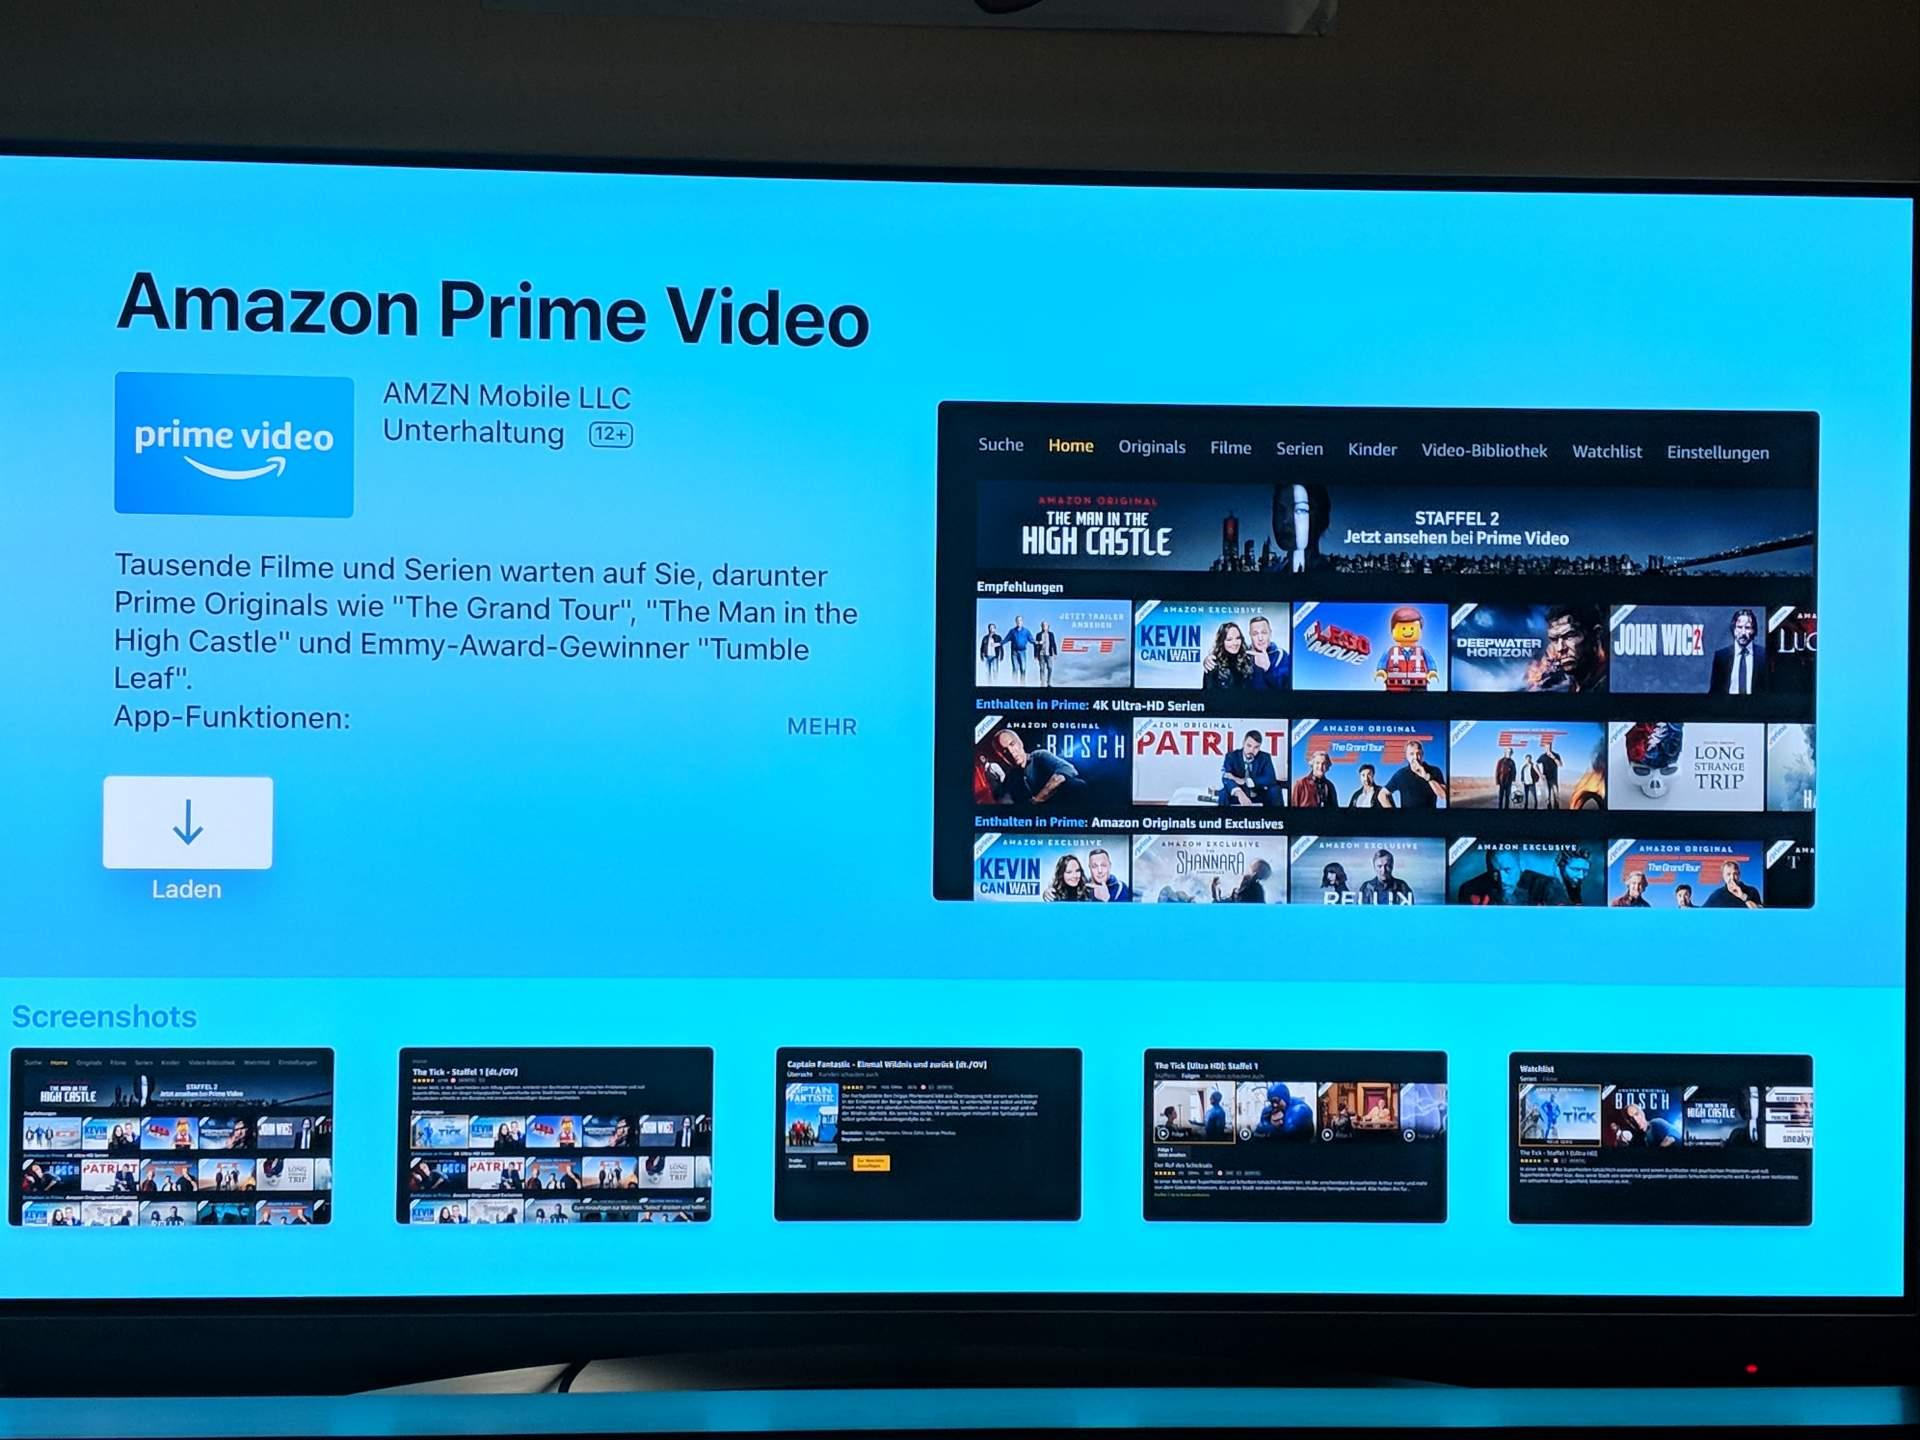 Amazon Prime Video Auf Tv Streamen